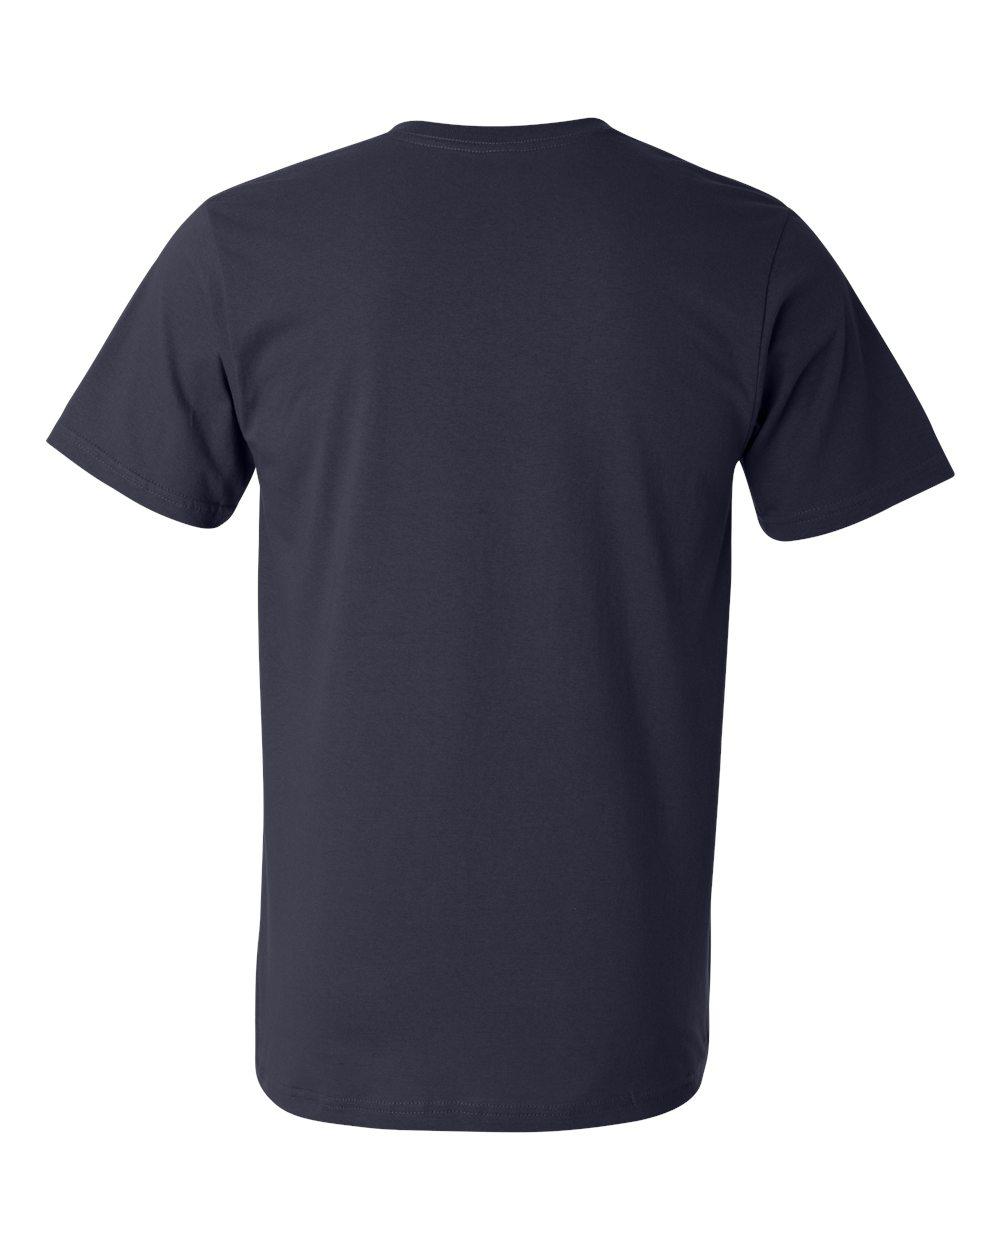 Anvil-Men-039-s-Lightweight-V-Neck-T-Shirt-982-S-3XL thumbnail 19